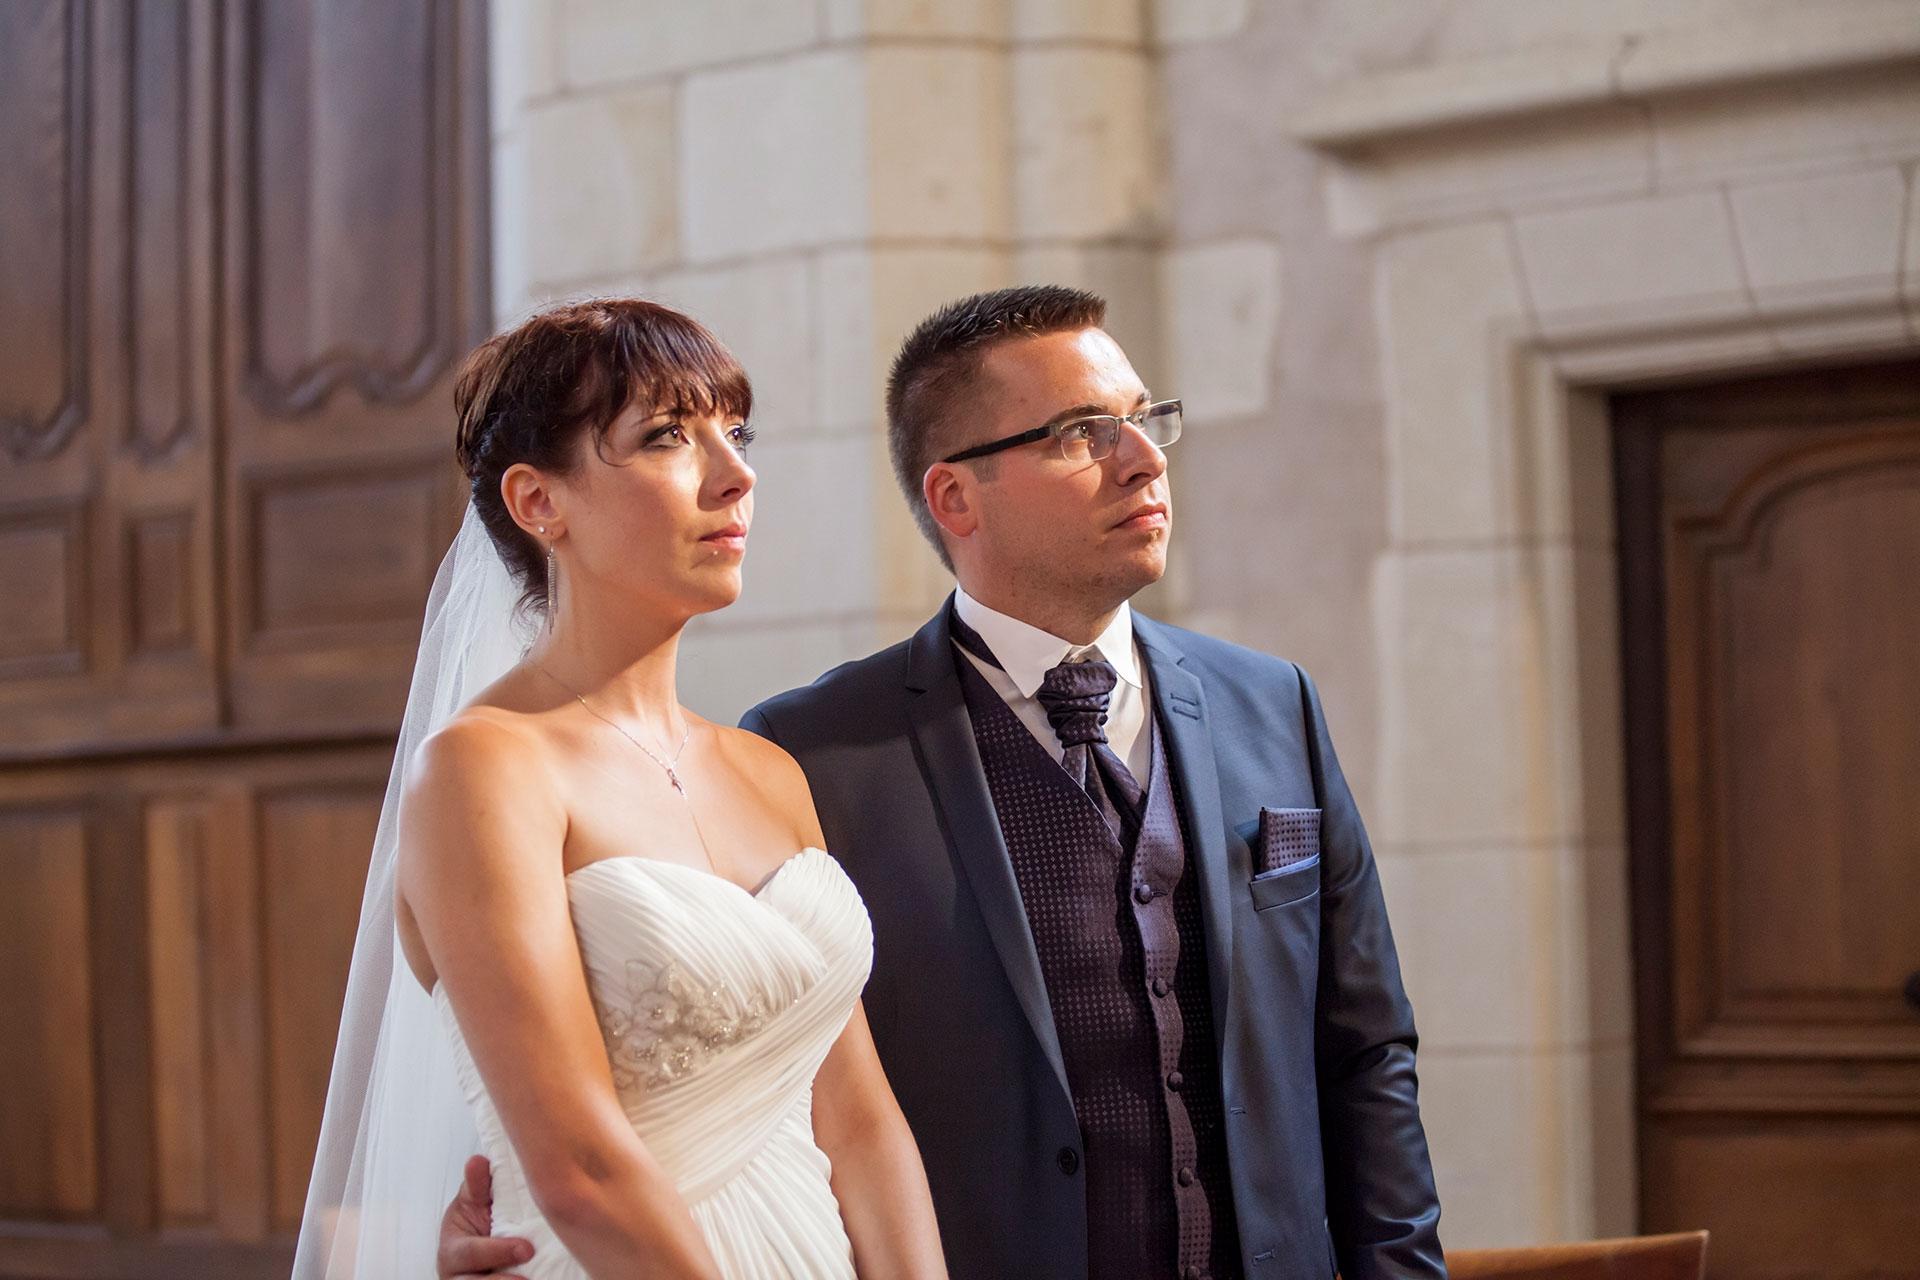 particuliers-evenements-mariages-oui-aurelie&geoffrey-14